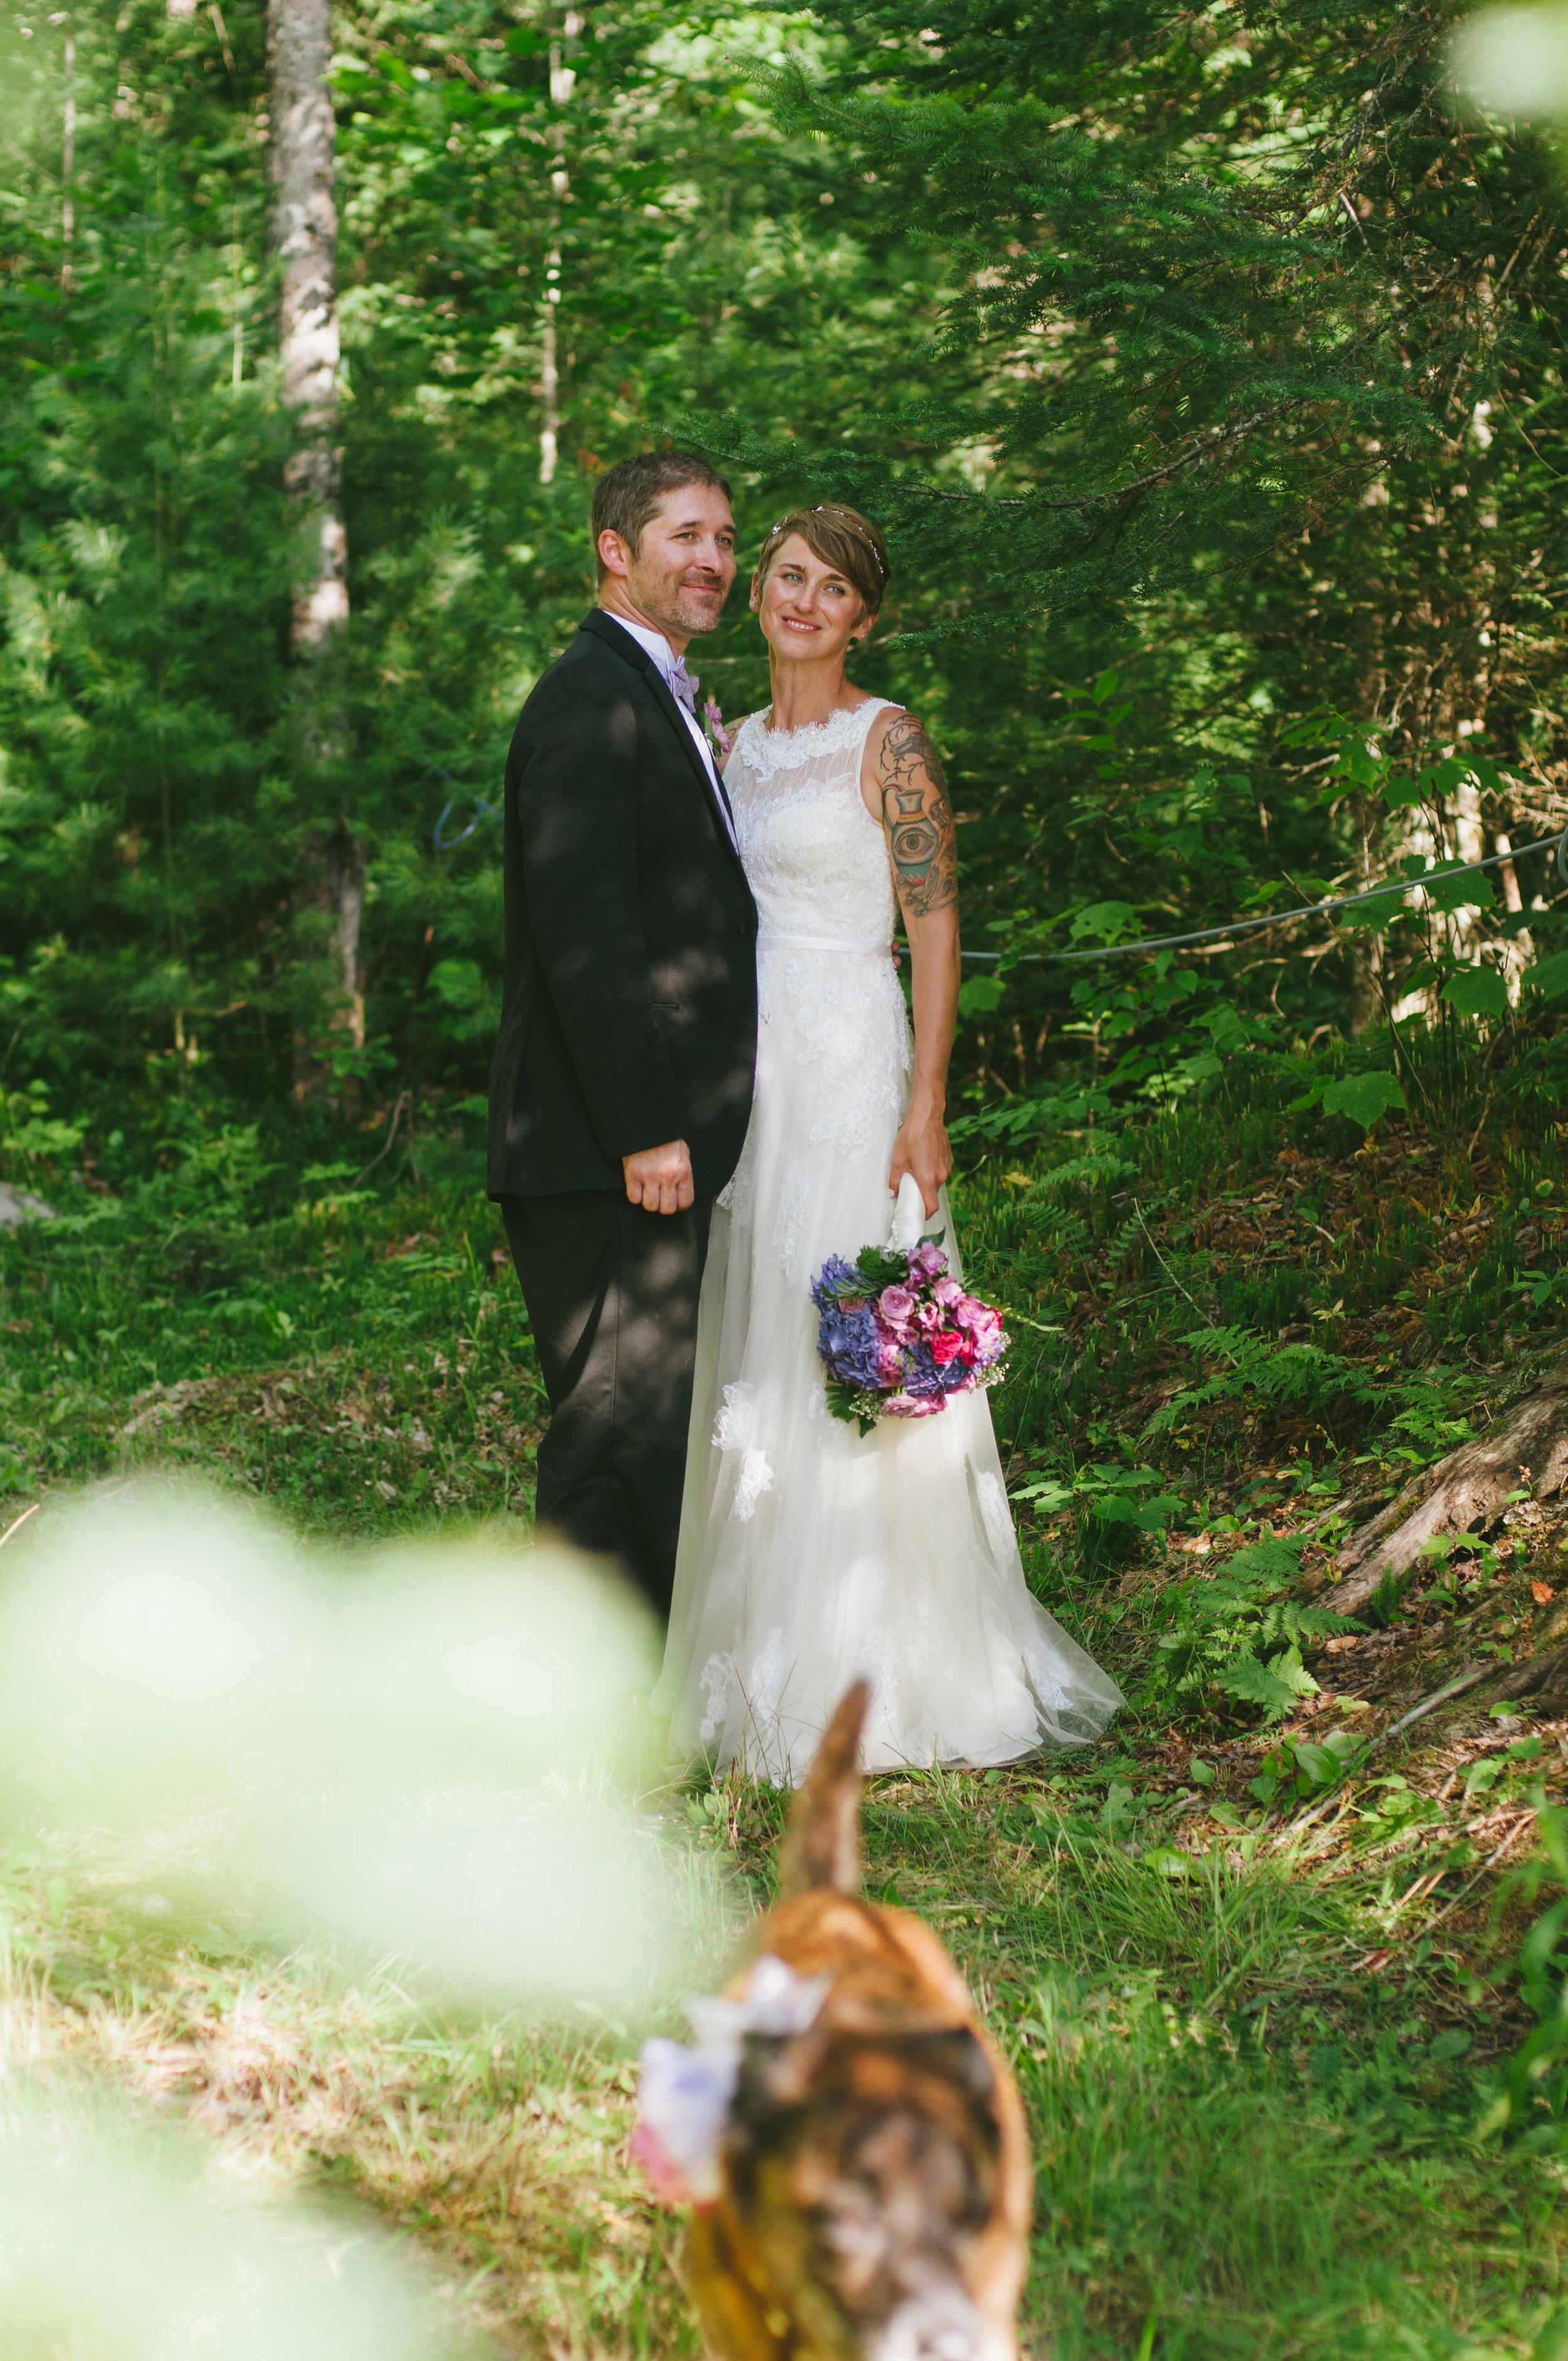 NH-Wedding-2015-1.jpg